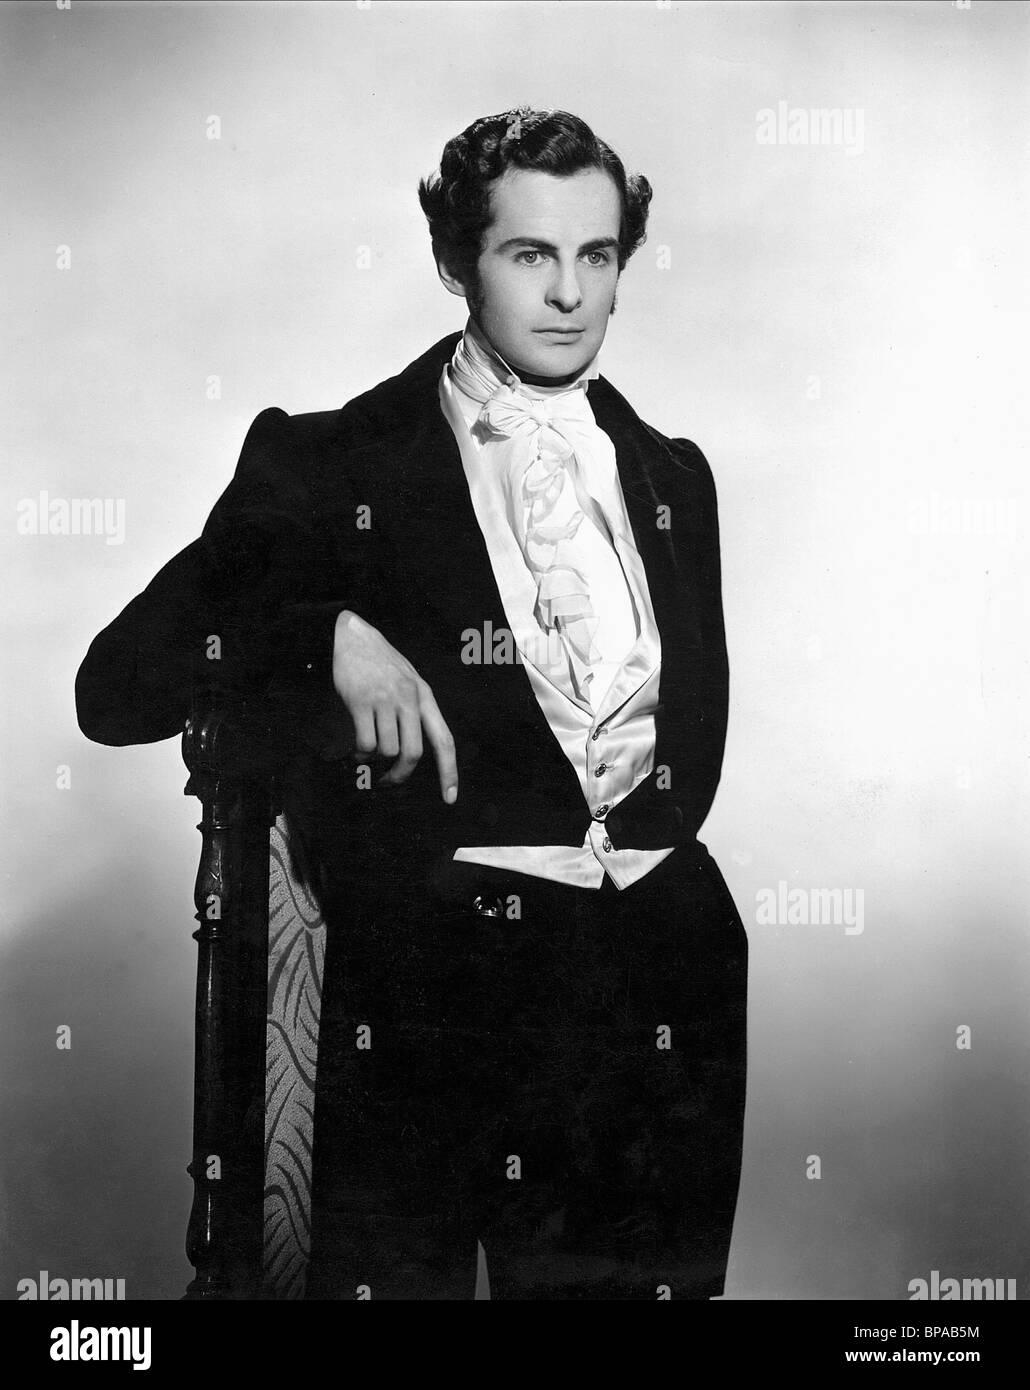 DEREK BOND UNCLE SILAS (1947) - Stock Image